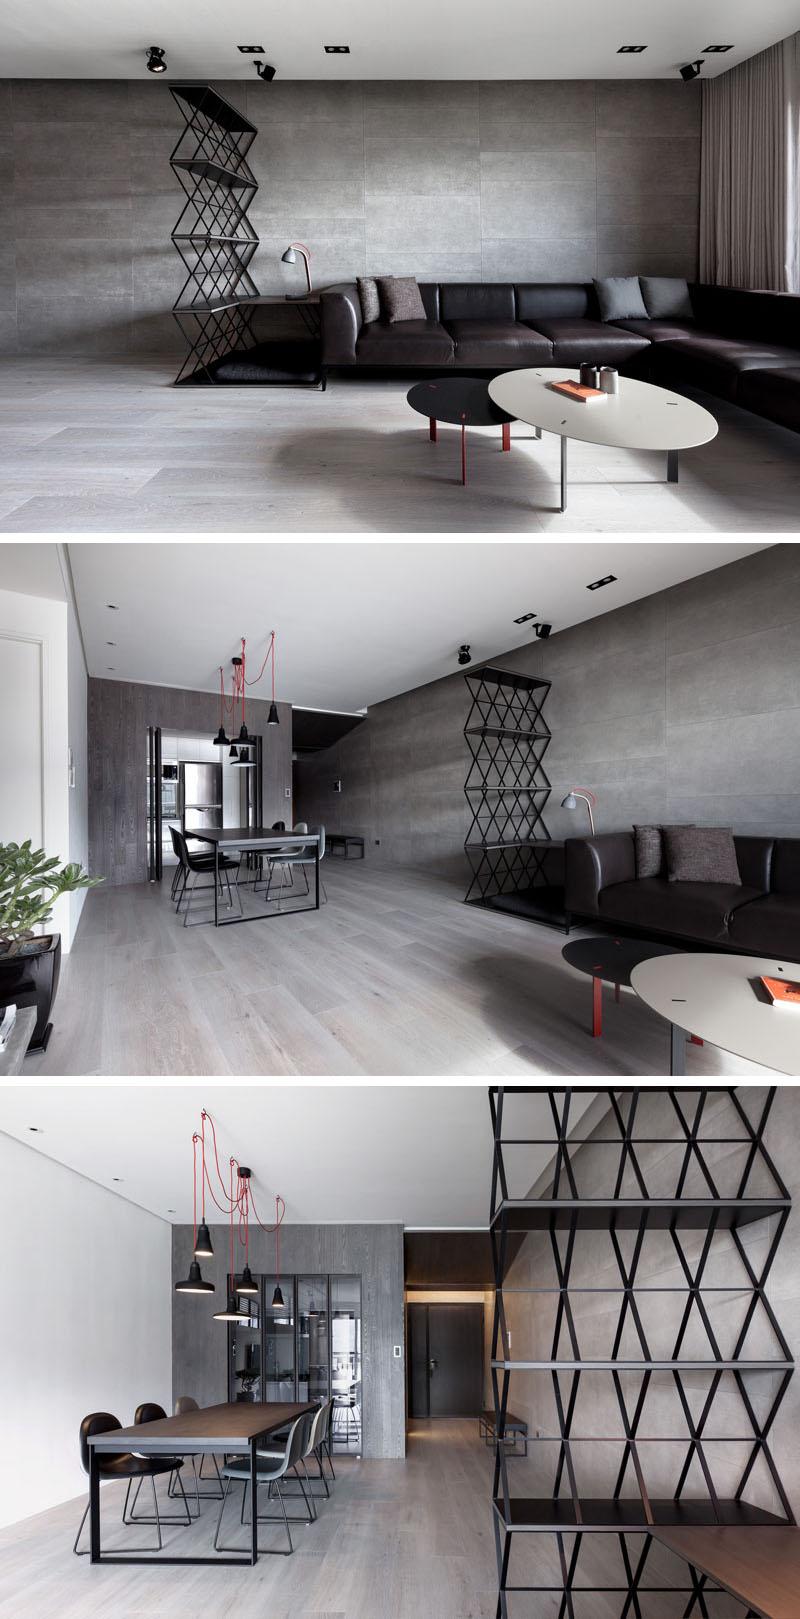 dog-bed-room-divider-table-220117-1045-04